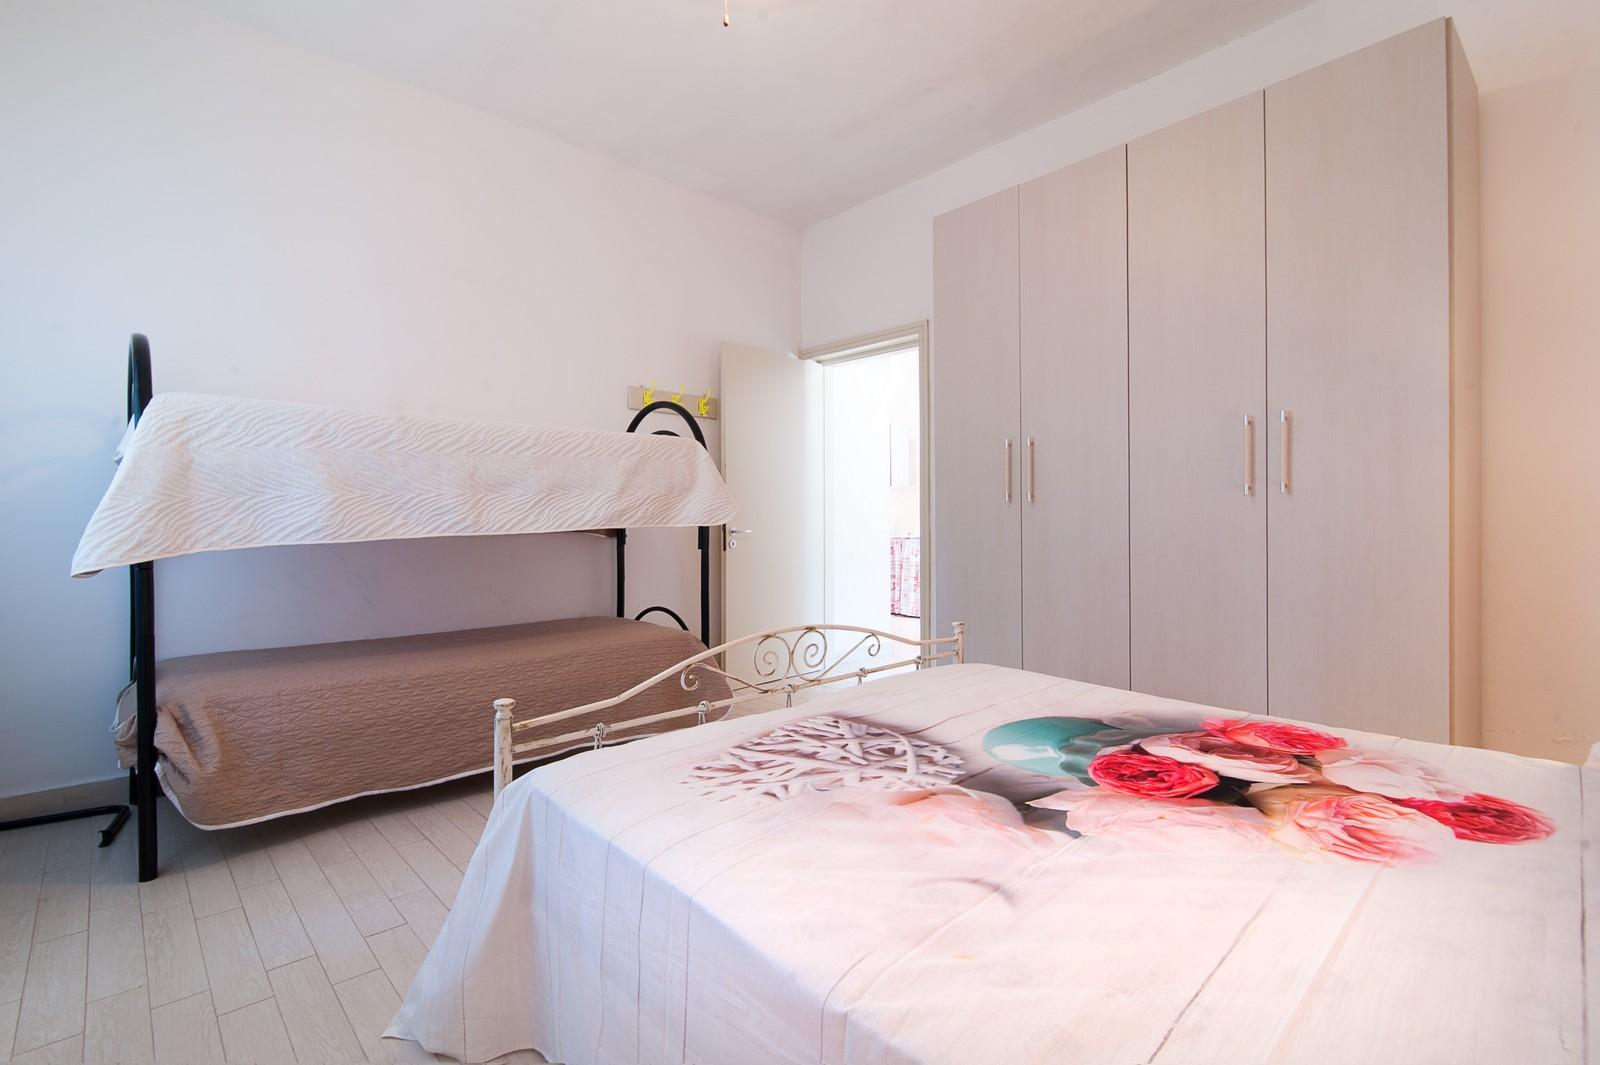 Ferienhaus Villa Mariposa  n. 2-150 meters from the beach (2354066), Porto Cesareo, Lecce, Apulien, Italien, Bild 7